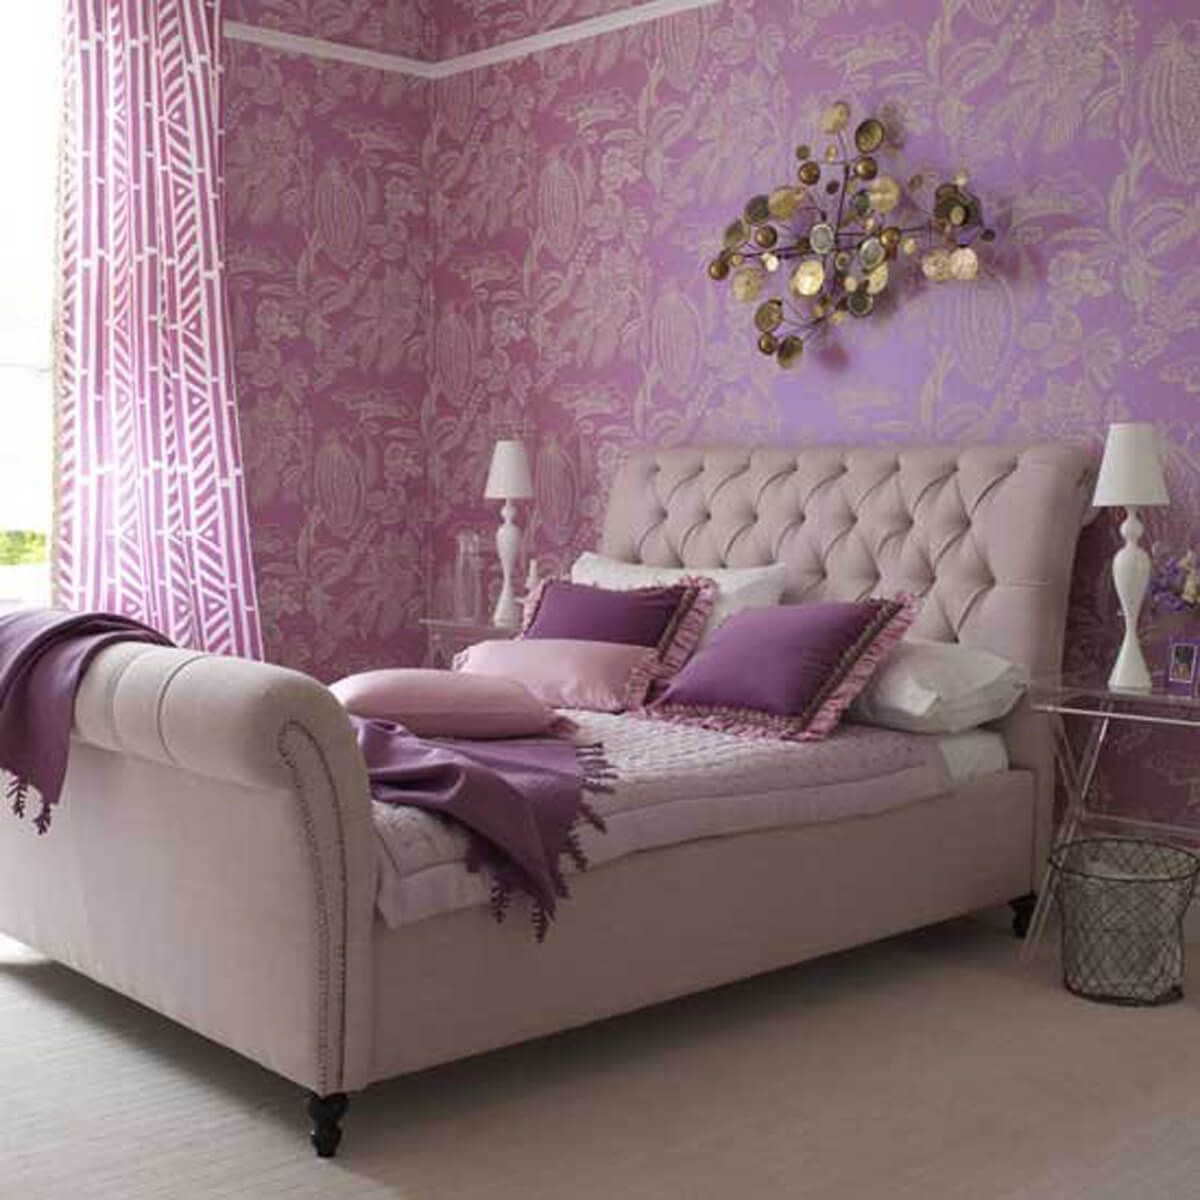 decorative-bedroom-decor-designs (1)